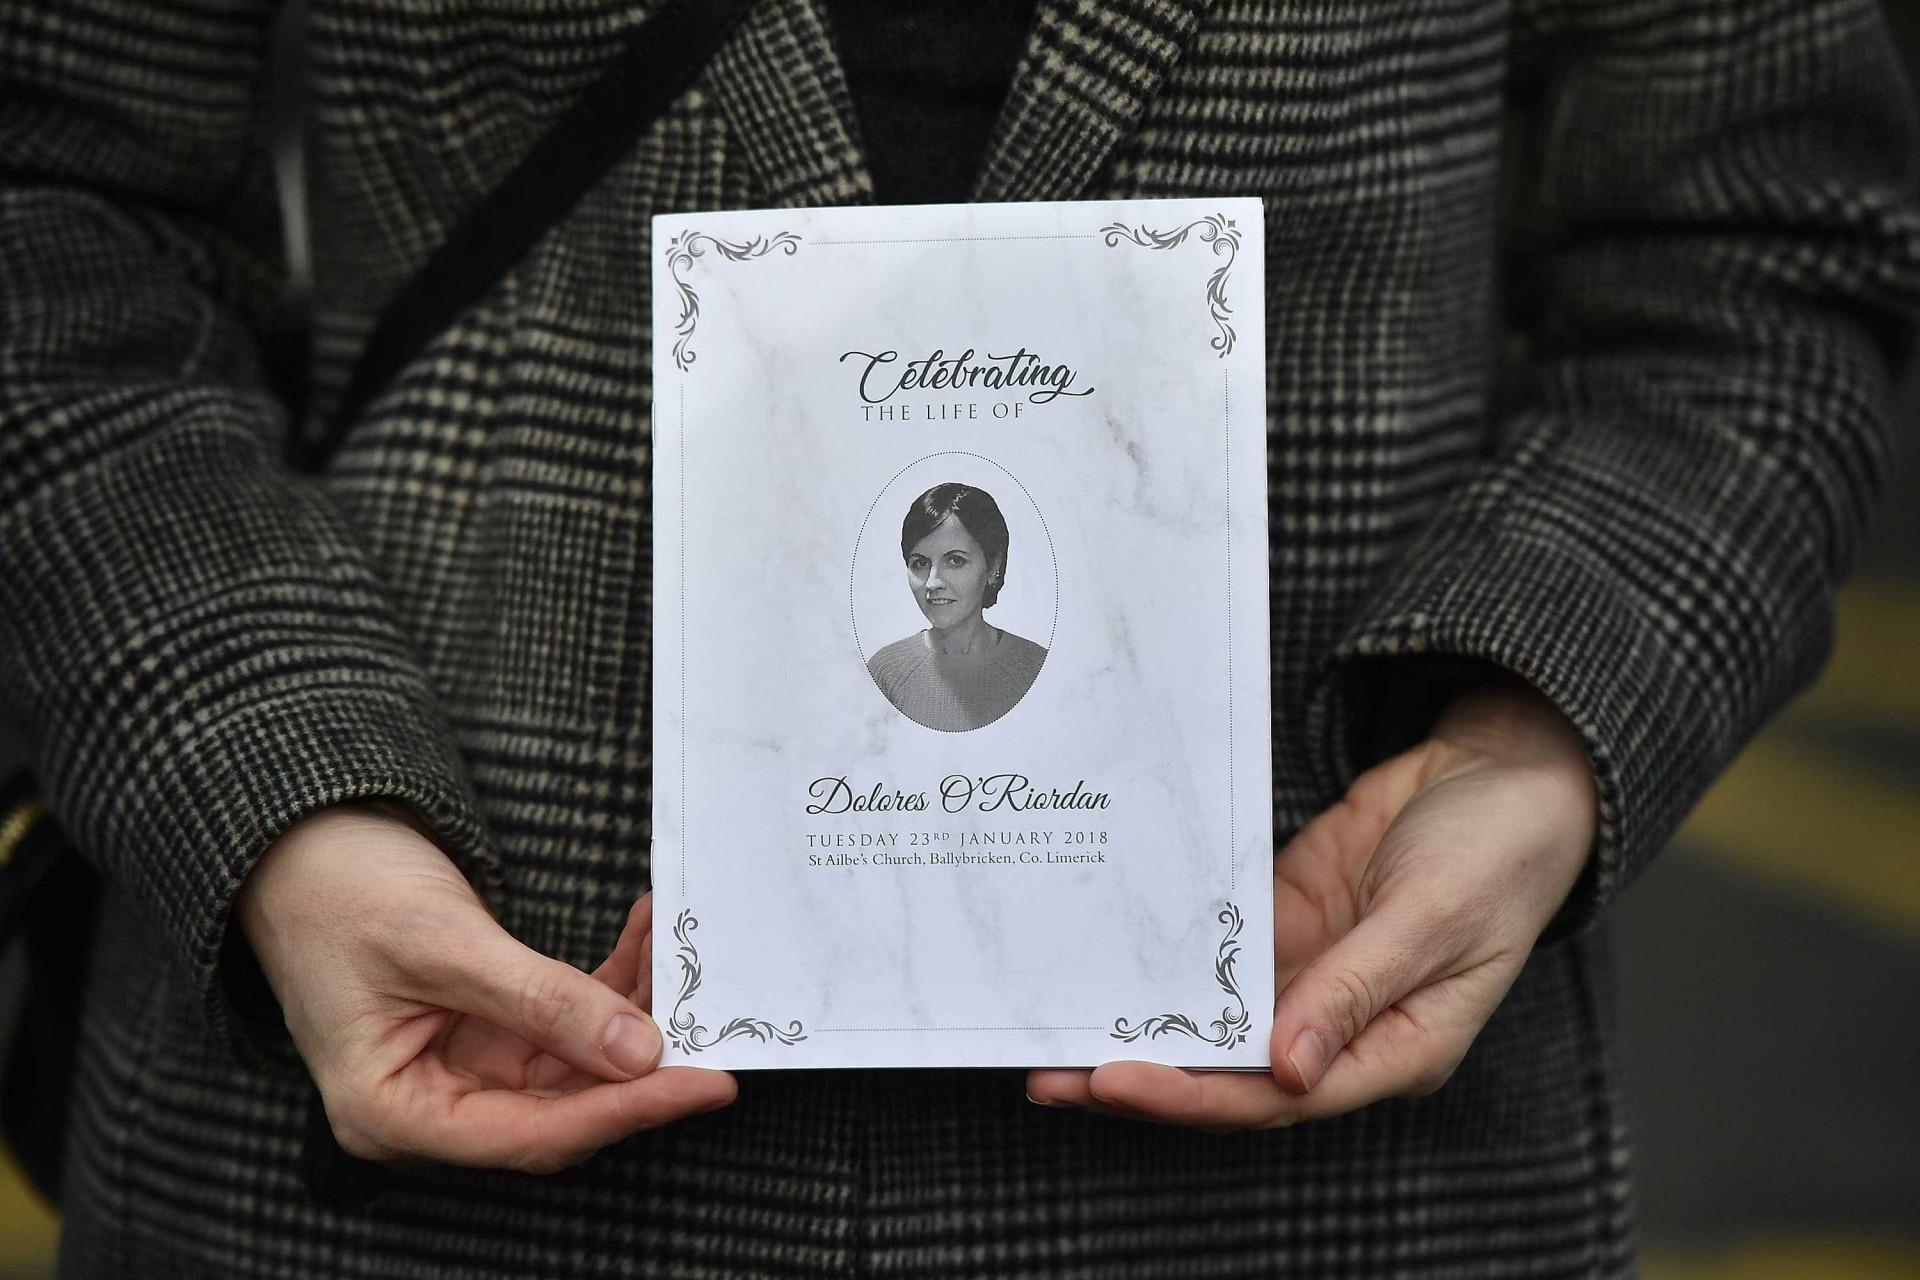 Amigos e familiares despedem-se de Dolores O'Riordan